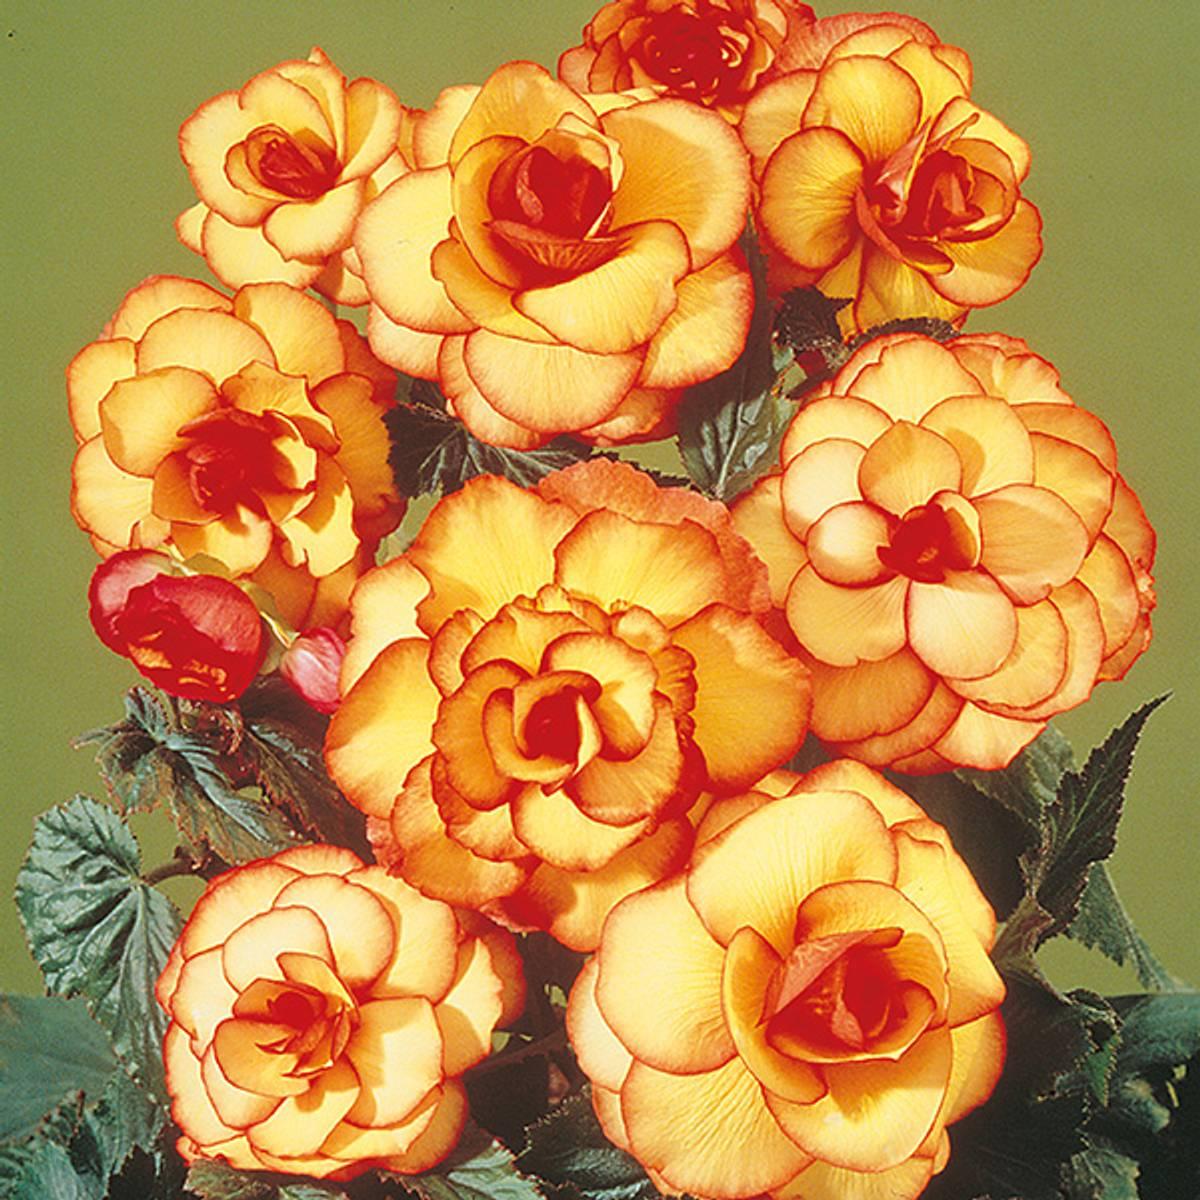 BEGONIA 'Picotee' rød/gul - Storblomstret. 3 stk.